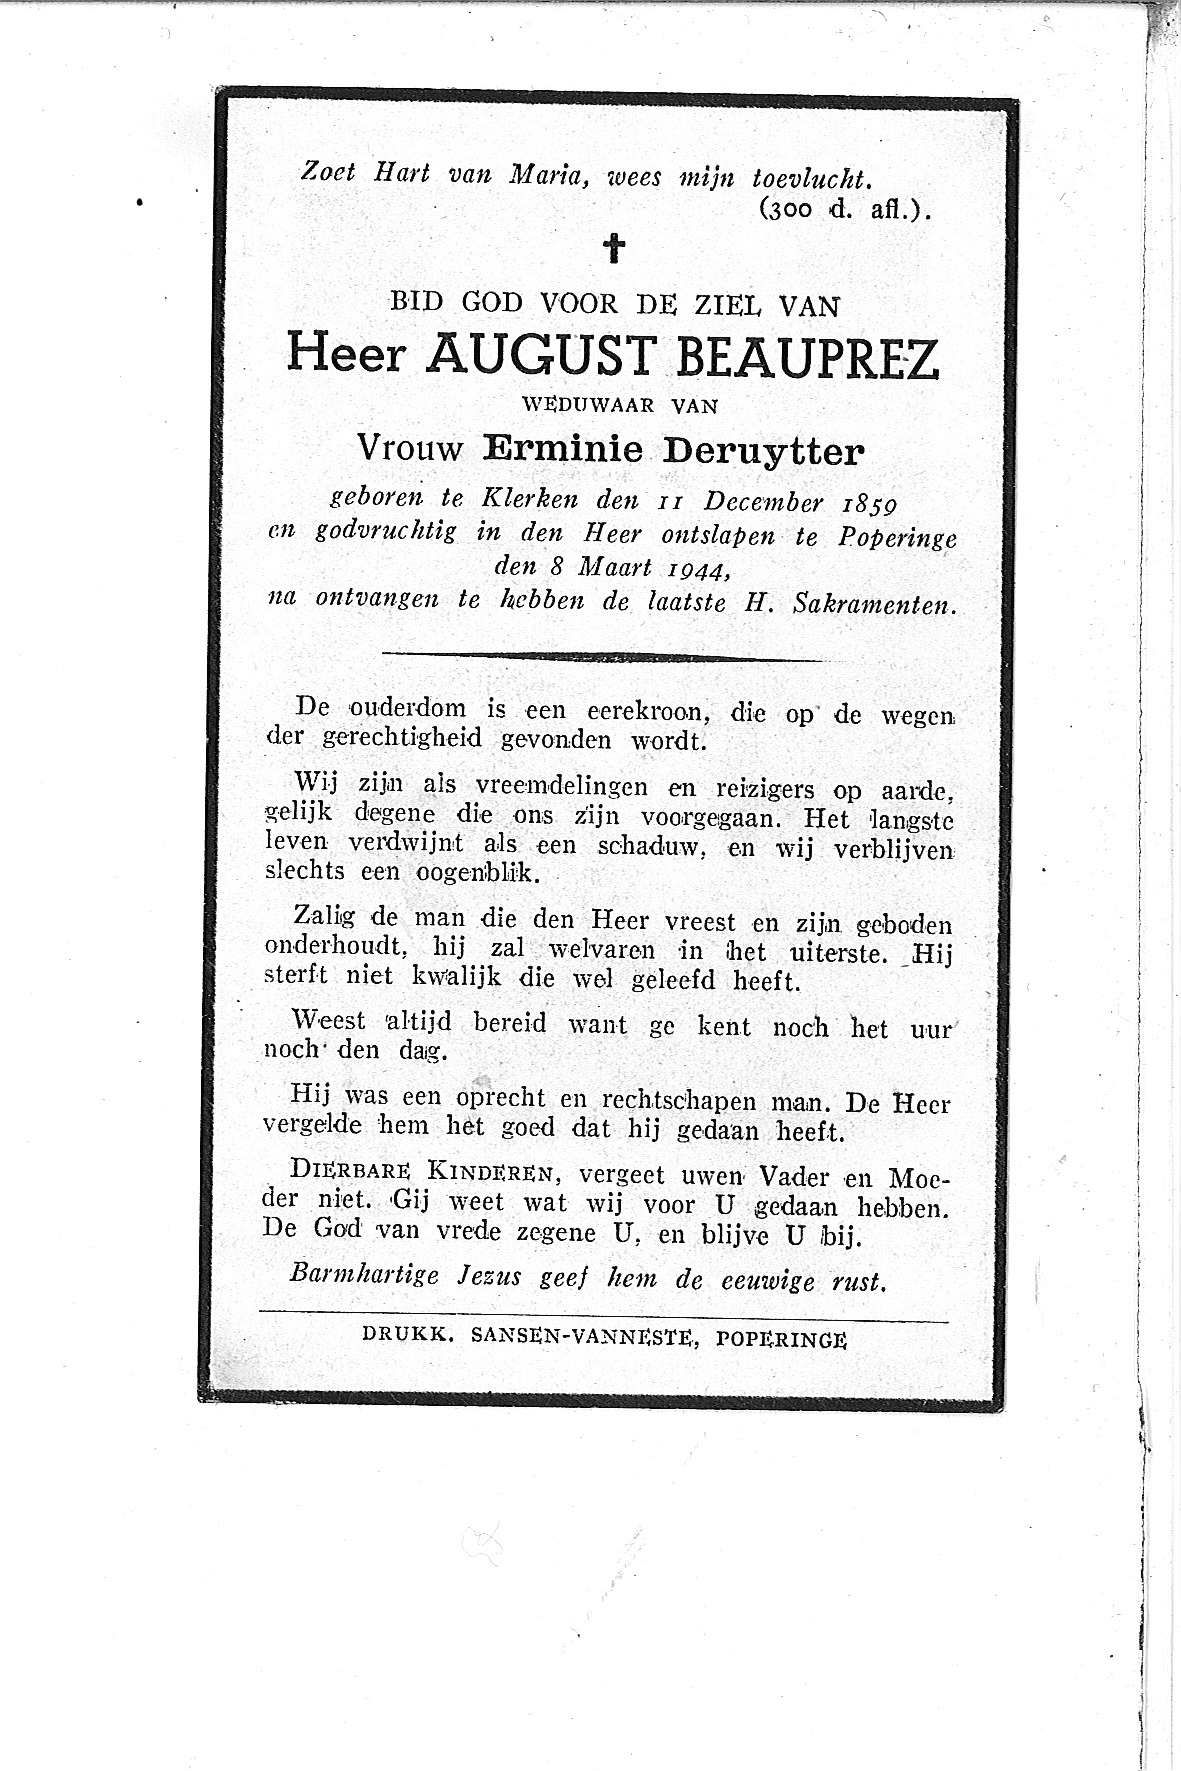 August(1944)20101119091254_00012.jpg